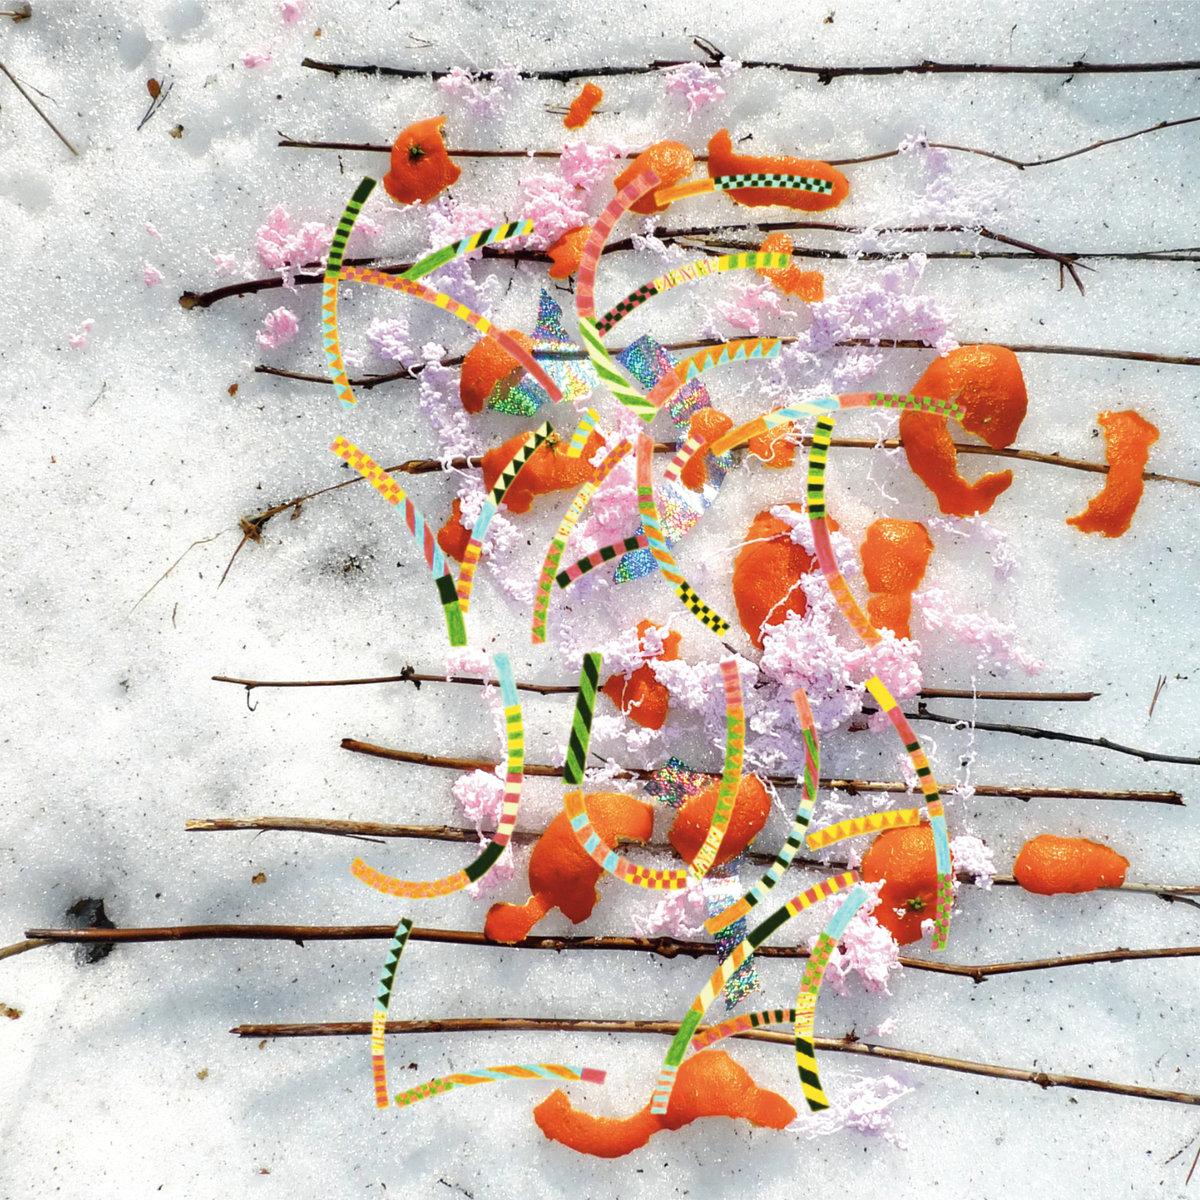 5. Tomutonttu - Kevätjuhla [A L T E R]